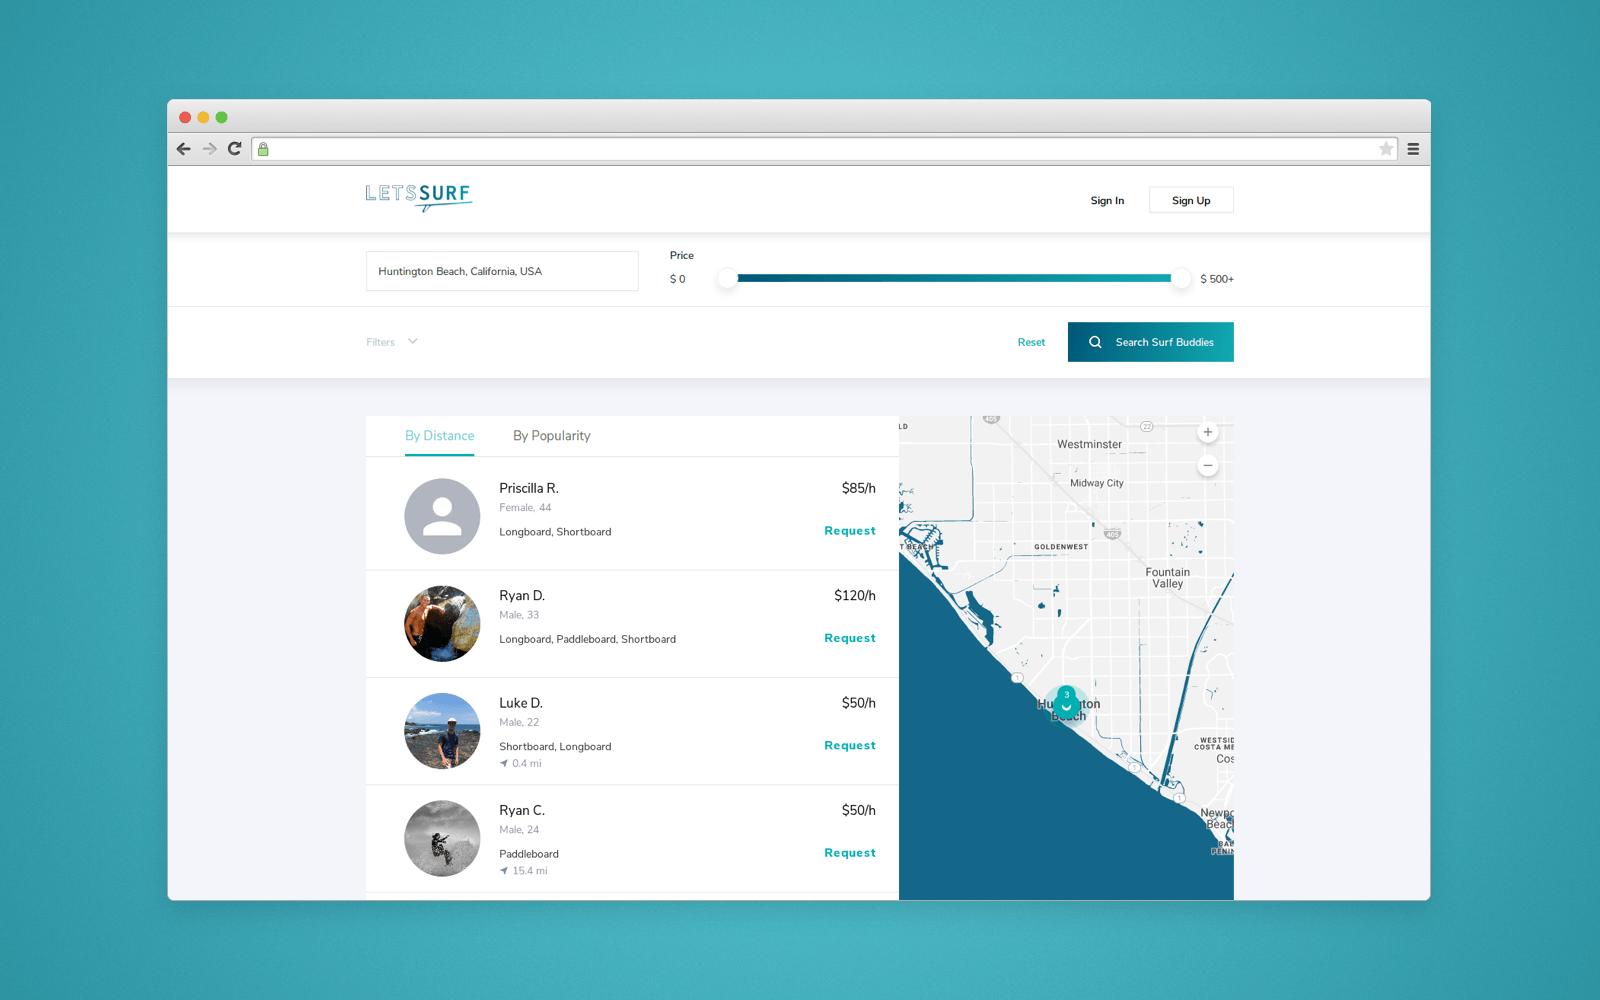 Web bersion of LetsSurf